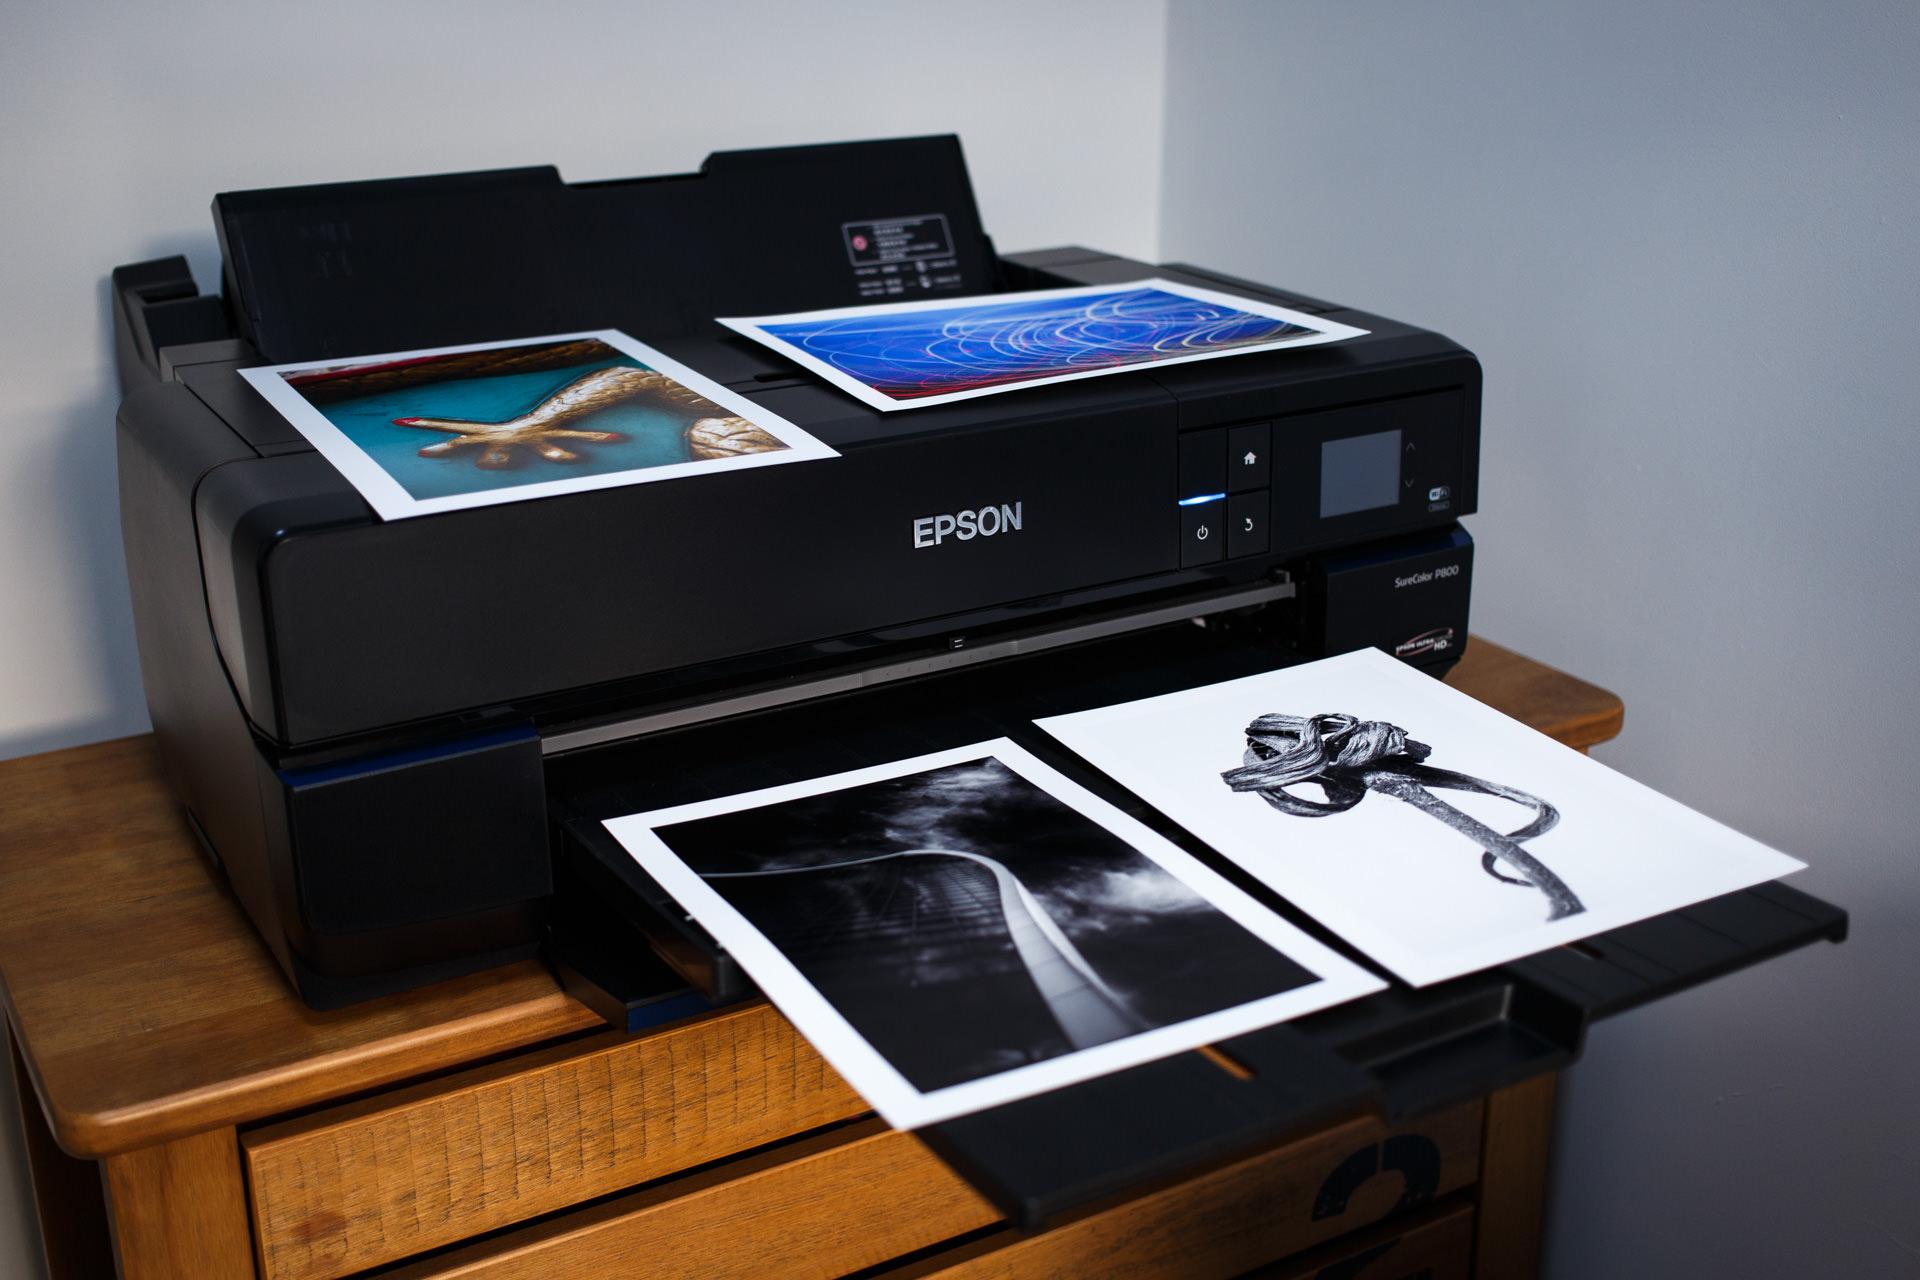 My Epson SureColour P800 printer.